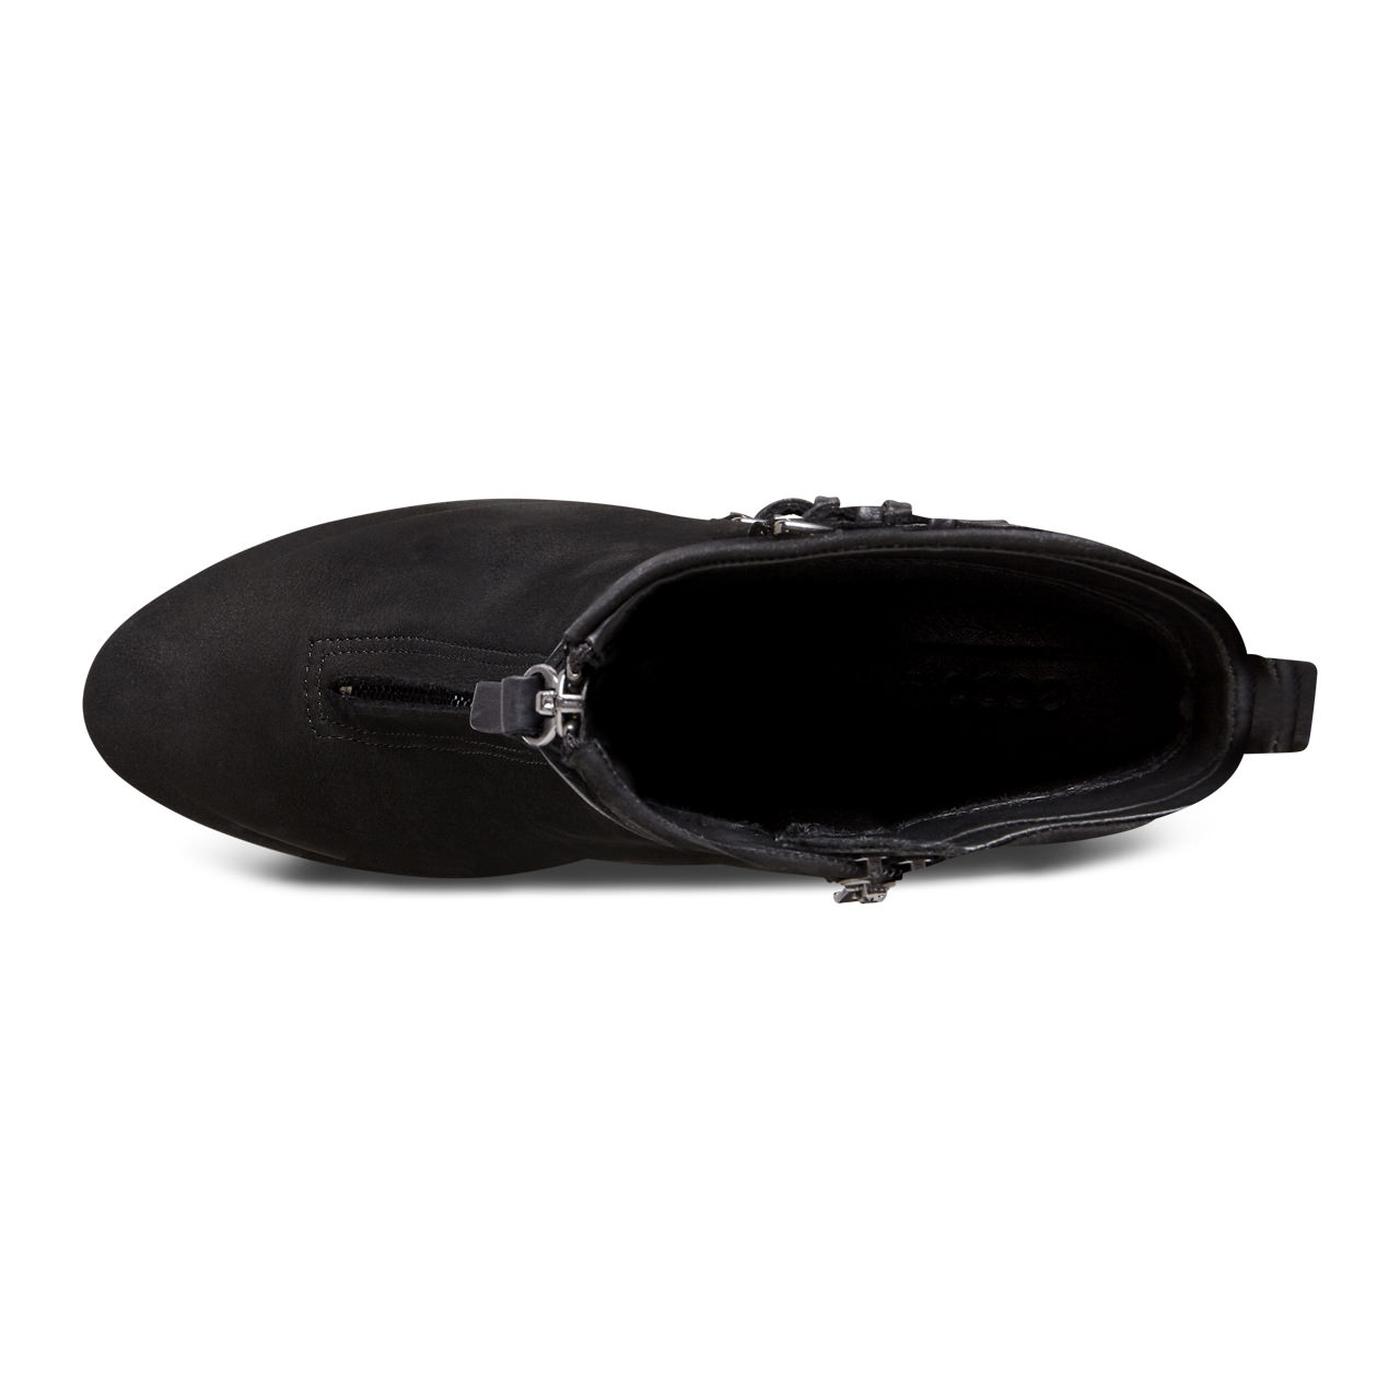 ECCO SHAPE SLEEK Ankle Boot 75mm